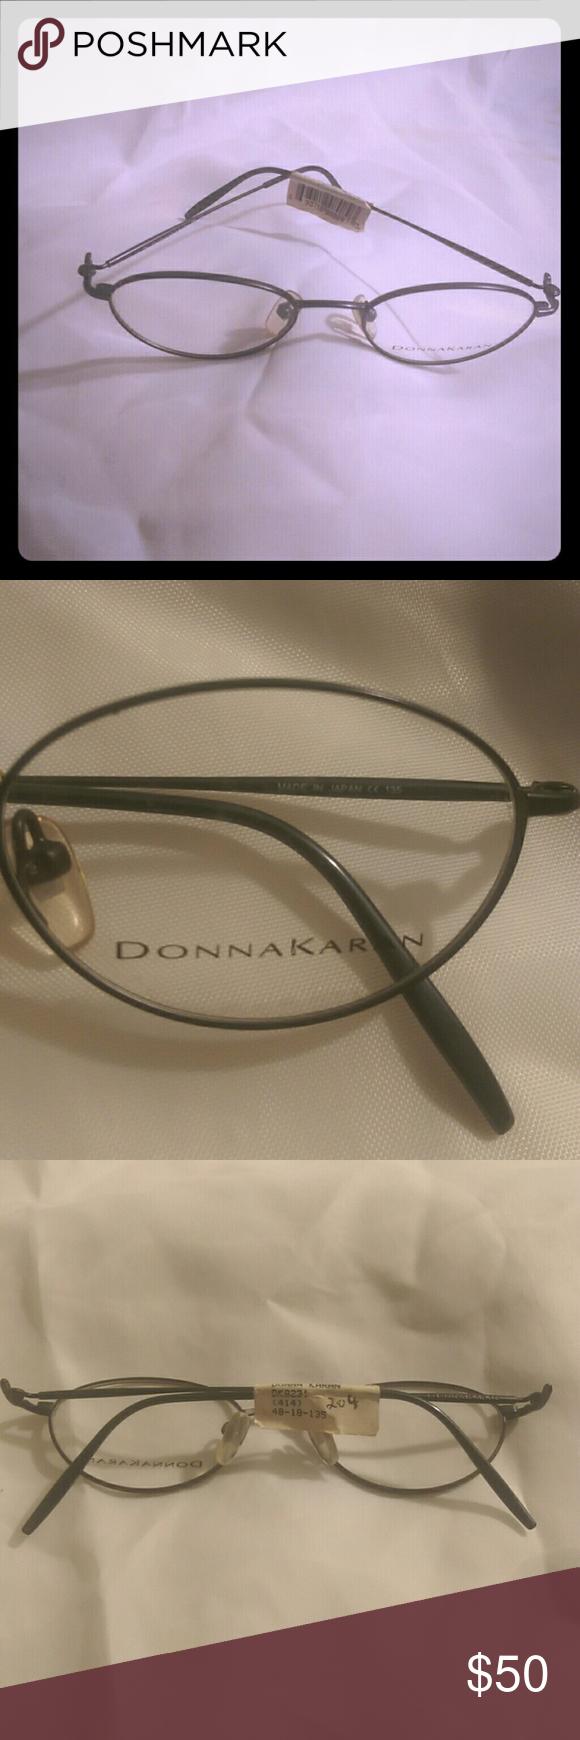 c9e55a27f172 Donna Karan eyewear NWT made in Japan New Never worn Donna Karan glasses.  NWT clear